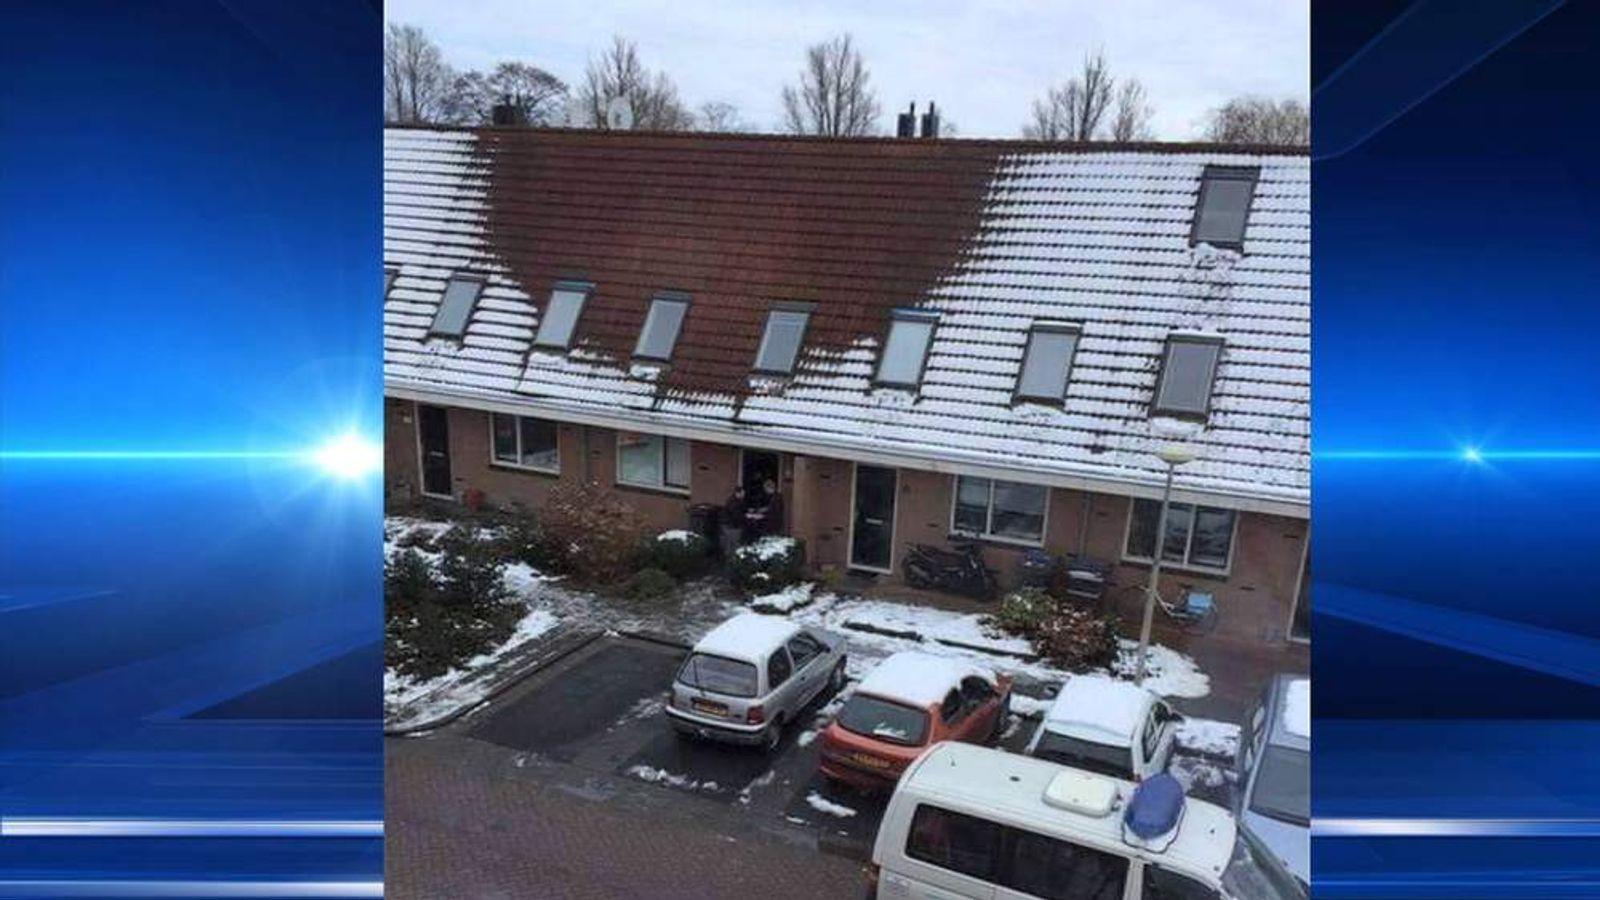 Melting Snow Helps Police Spot Cannabis Dens